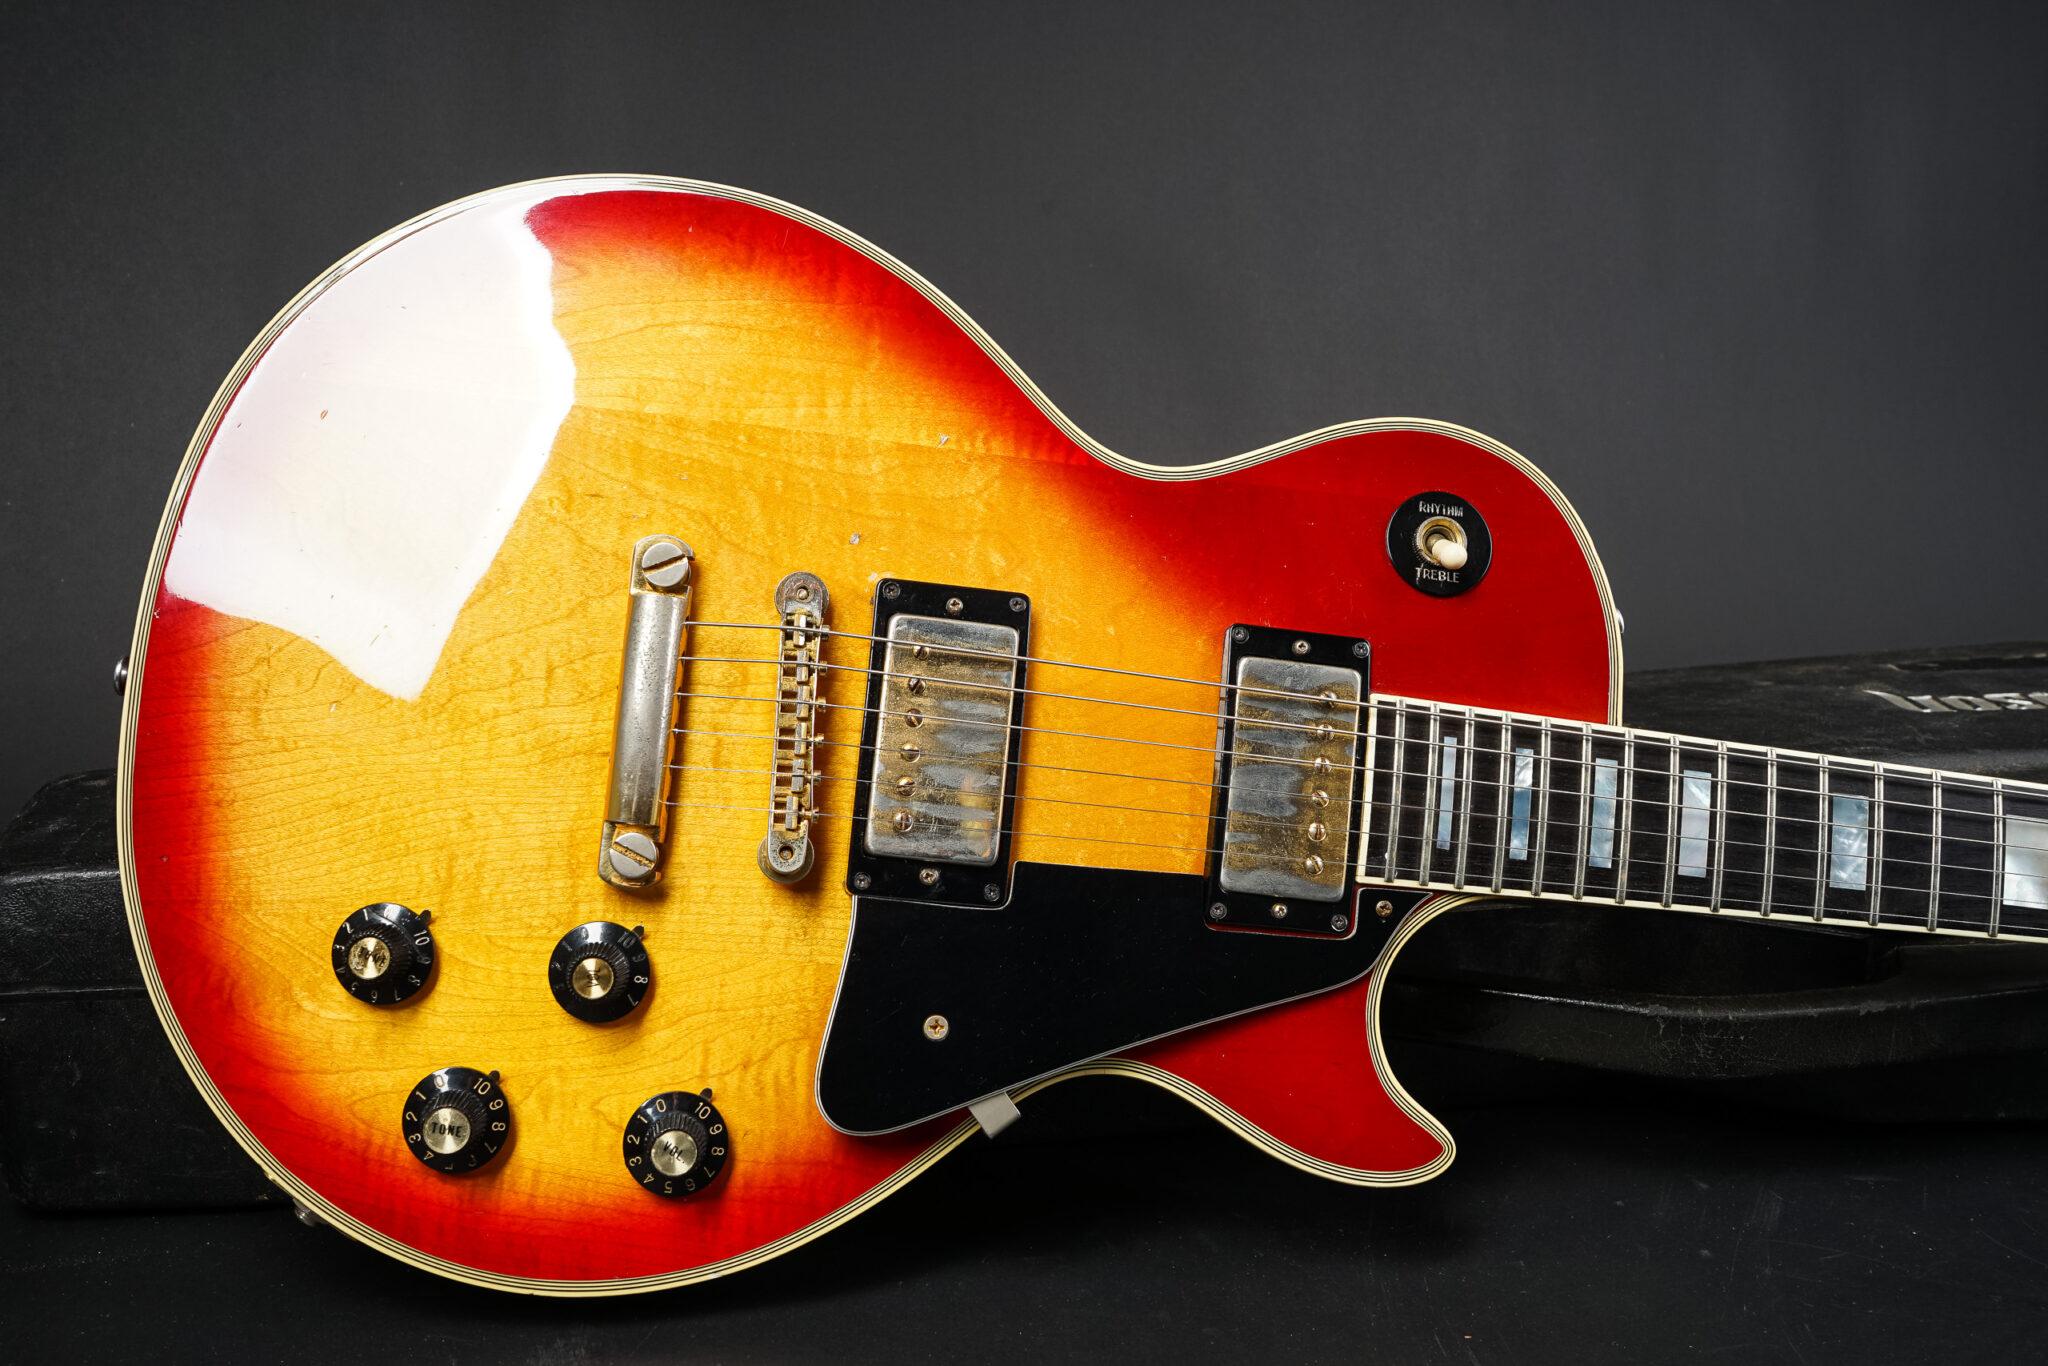 https://guitarpoint.de/app/uploads/products/1974-gibson-les-paul-custom-cherry-sunburst/1973-Gibson-Les-Paul-Custom-Cherry-SB-140141-9-2048x1366.jpg